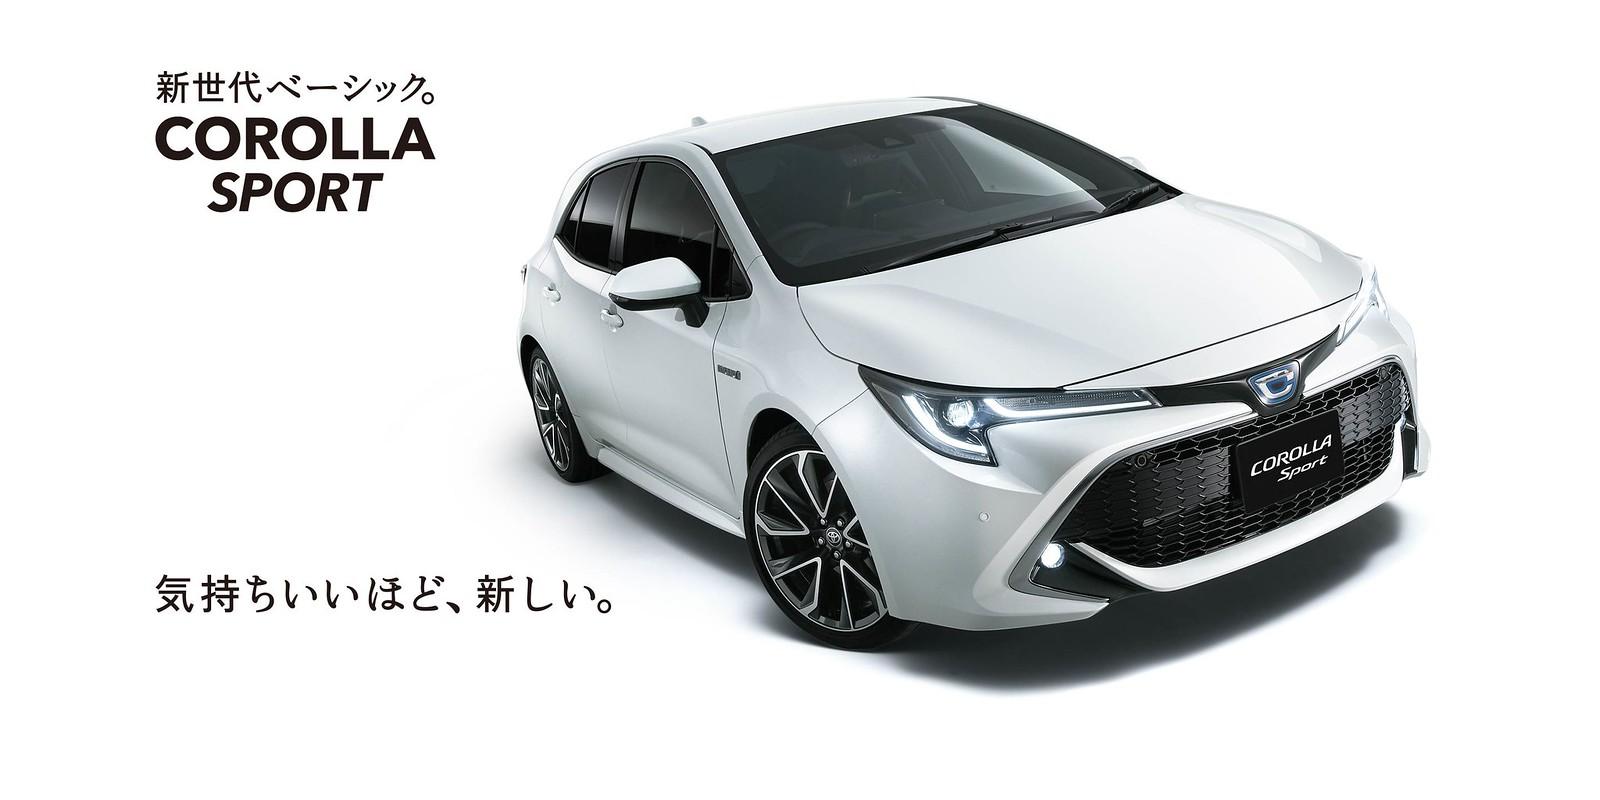 New Toyota Corolla Sport 2019